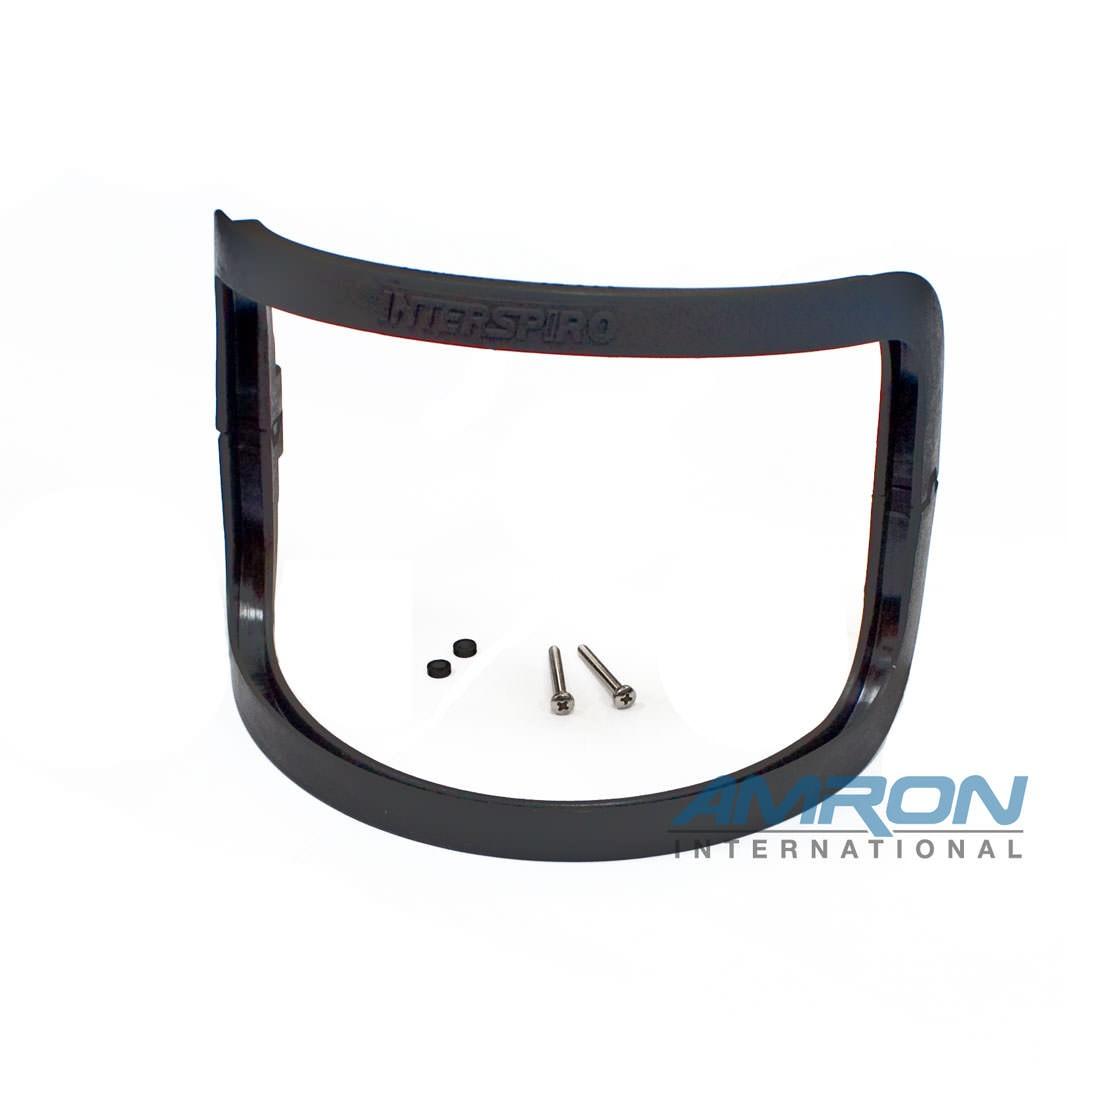 Interspiro AGA 460-190-547 Visor Frame Kit MKII Black - Includes No. 14-15